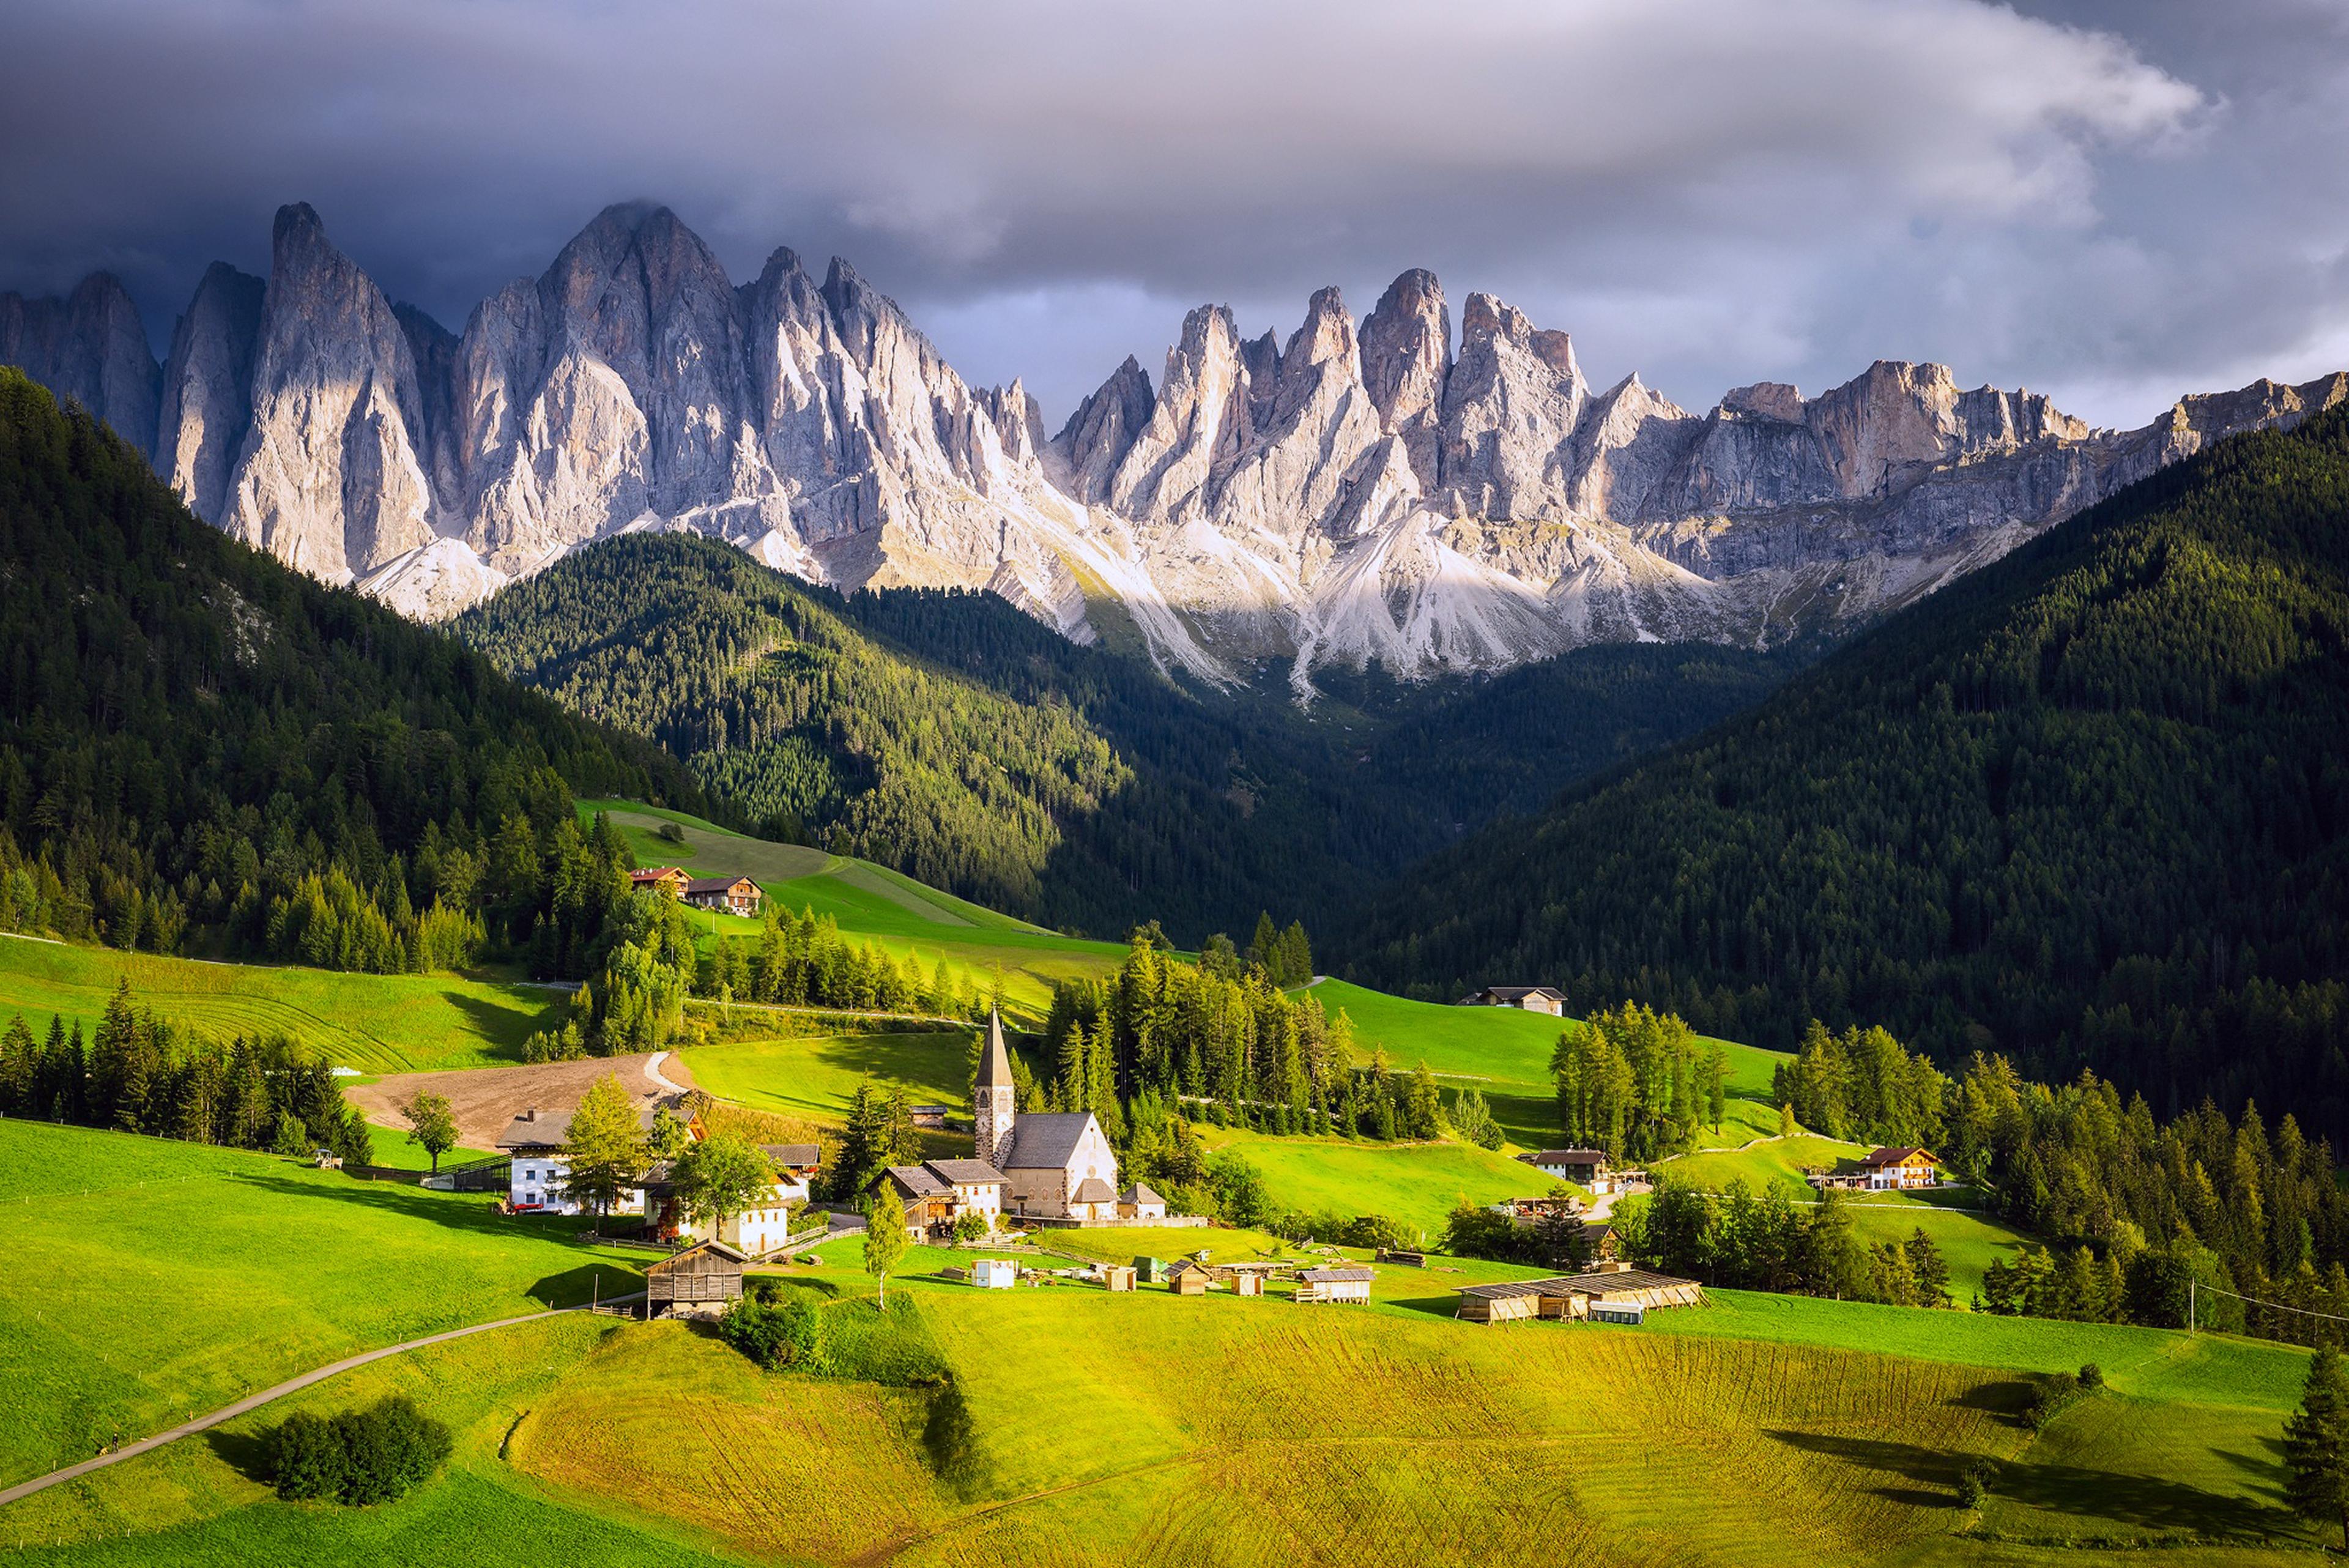 Italy countryside wallpaper wallpapersafari - Italy screensaver ...